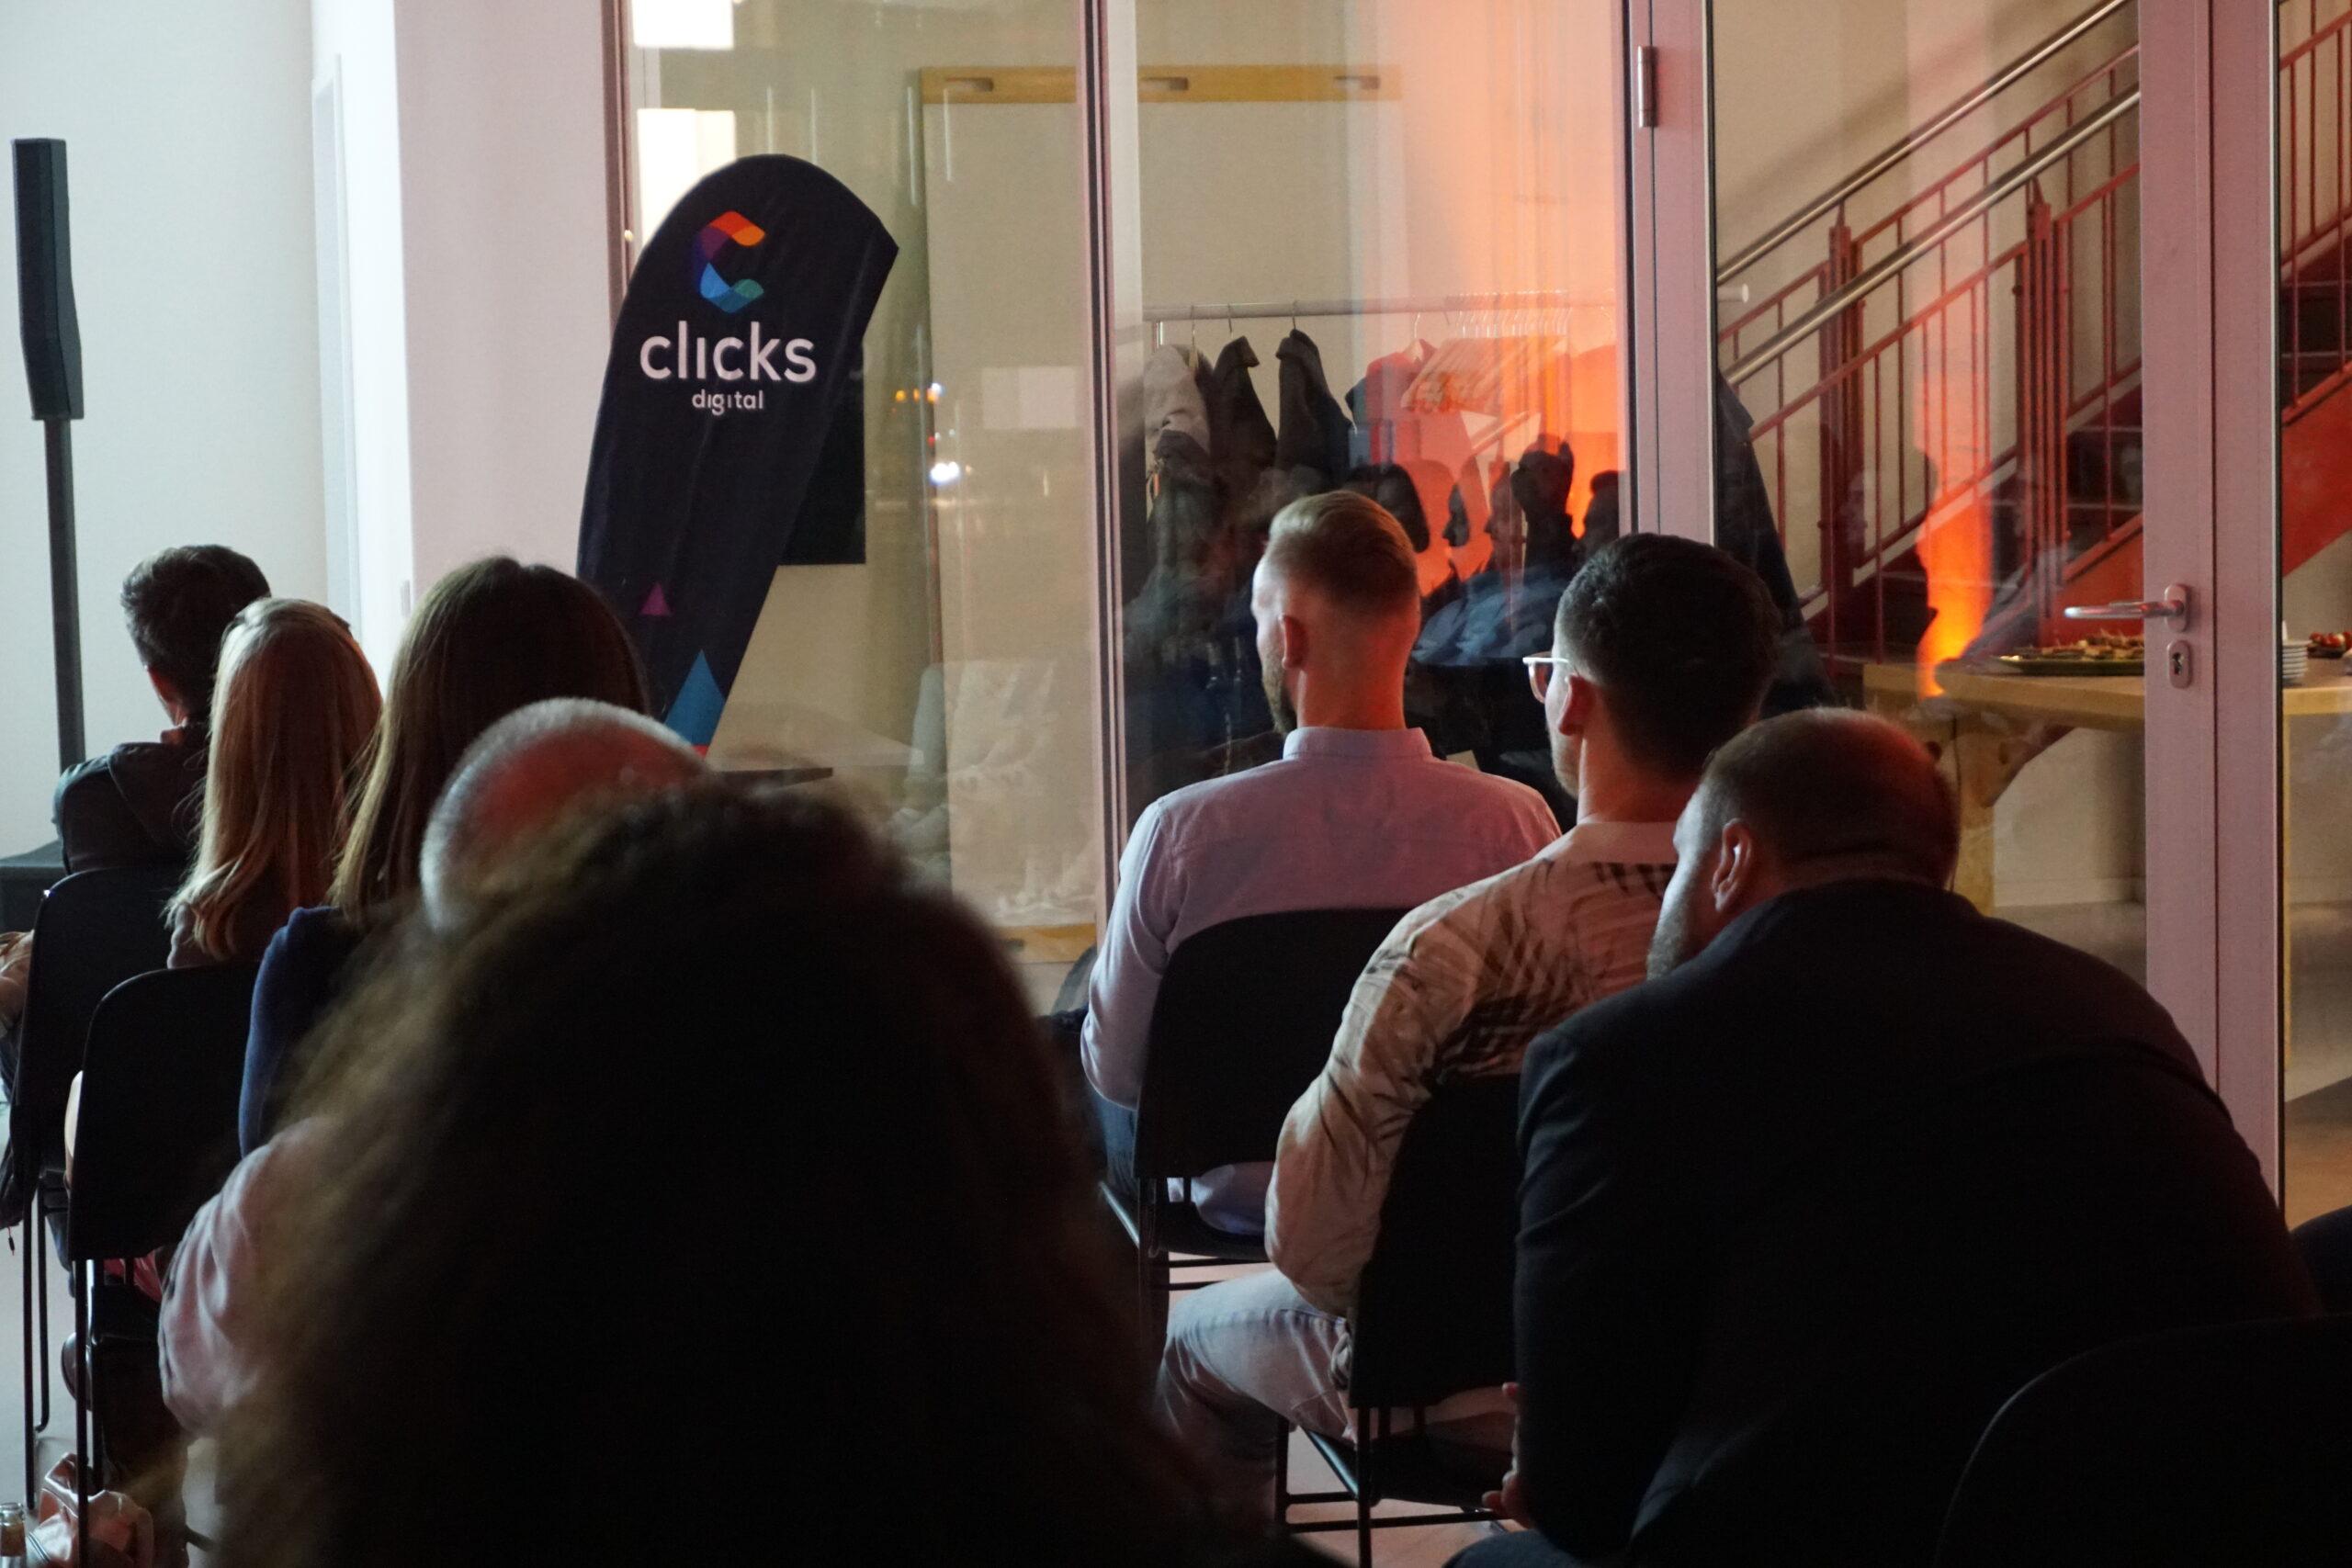 clicks-featured